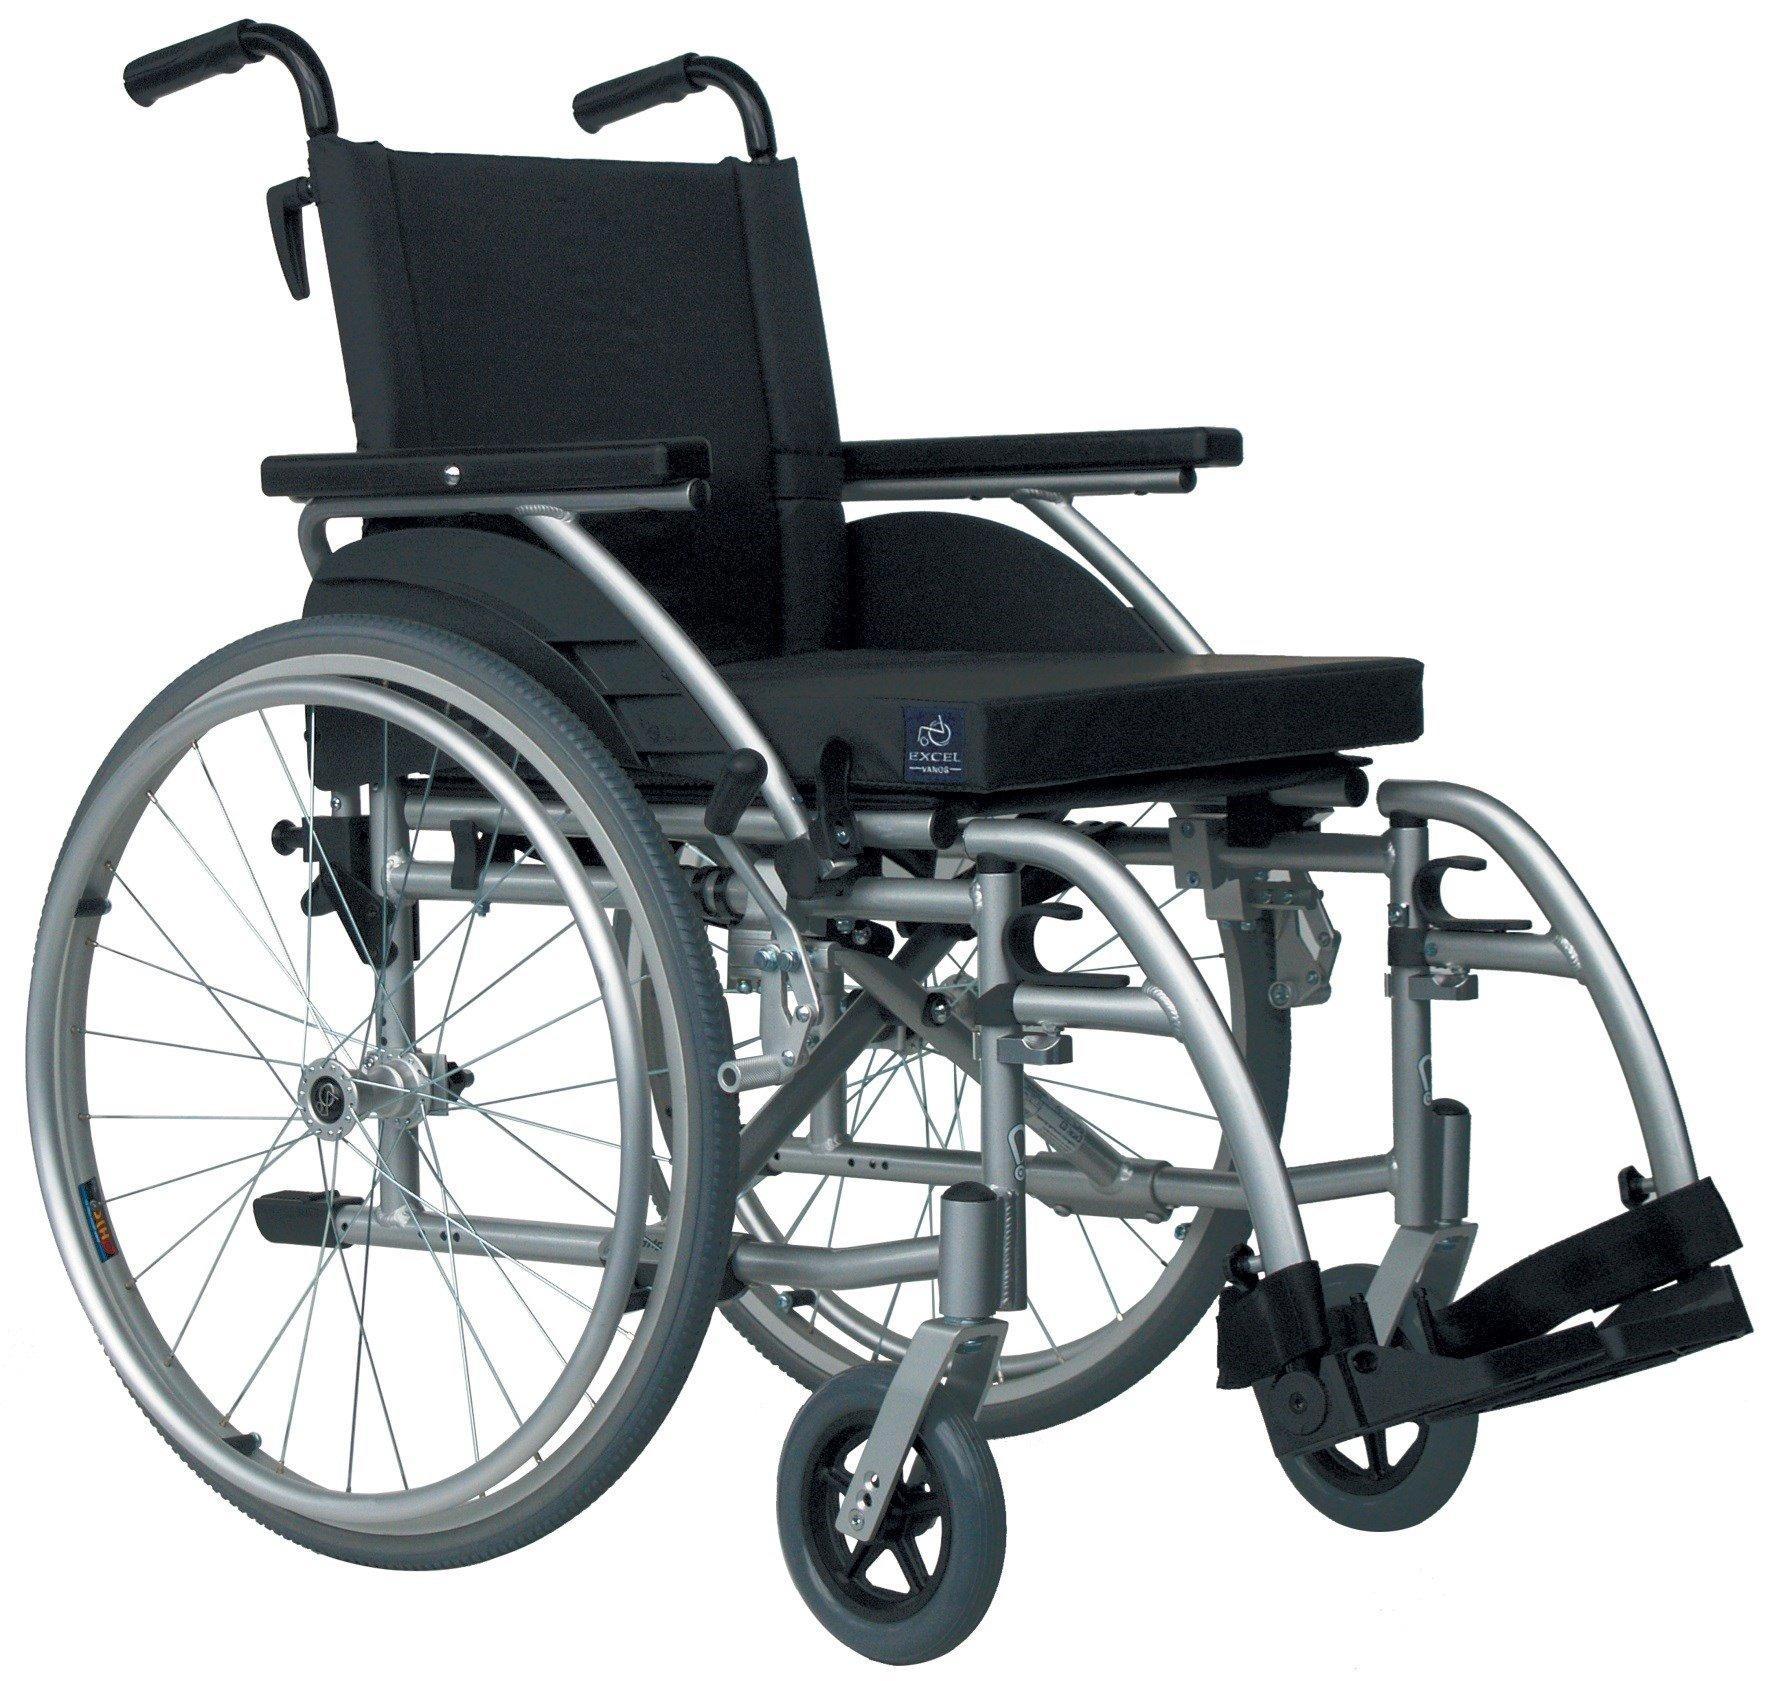 "Van Os Excel G3 'Lightweight' 24"" Rear Wheels"